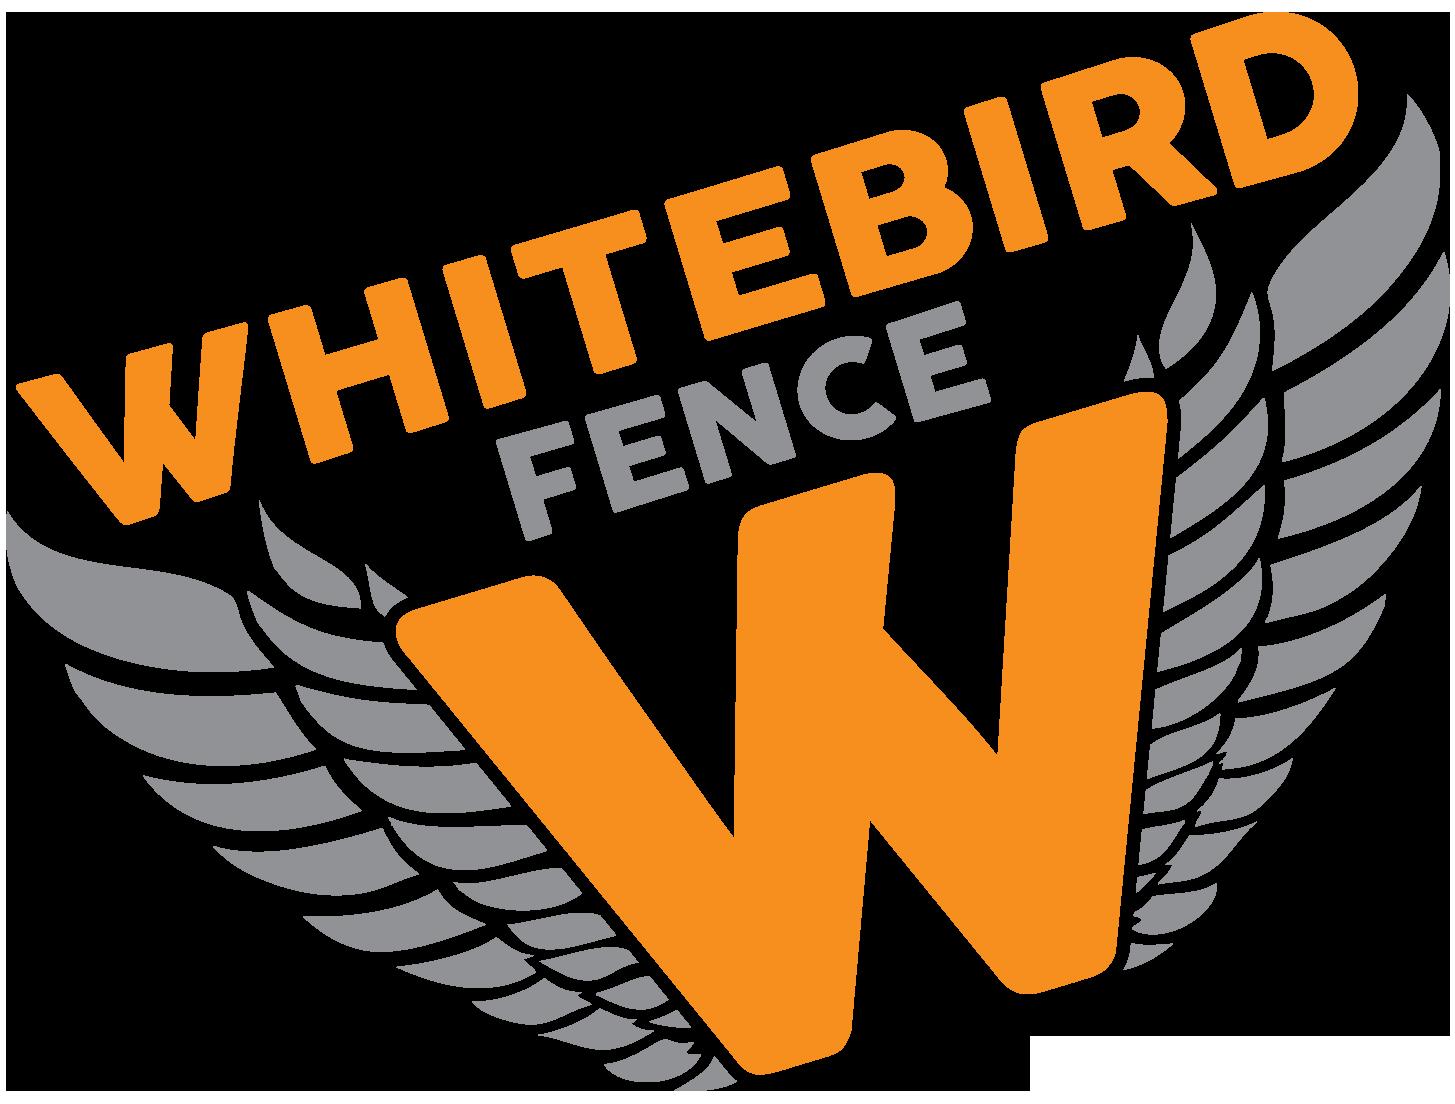 Whitebird Fence